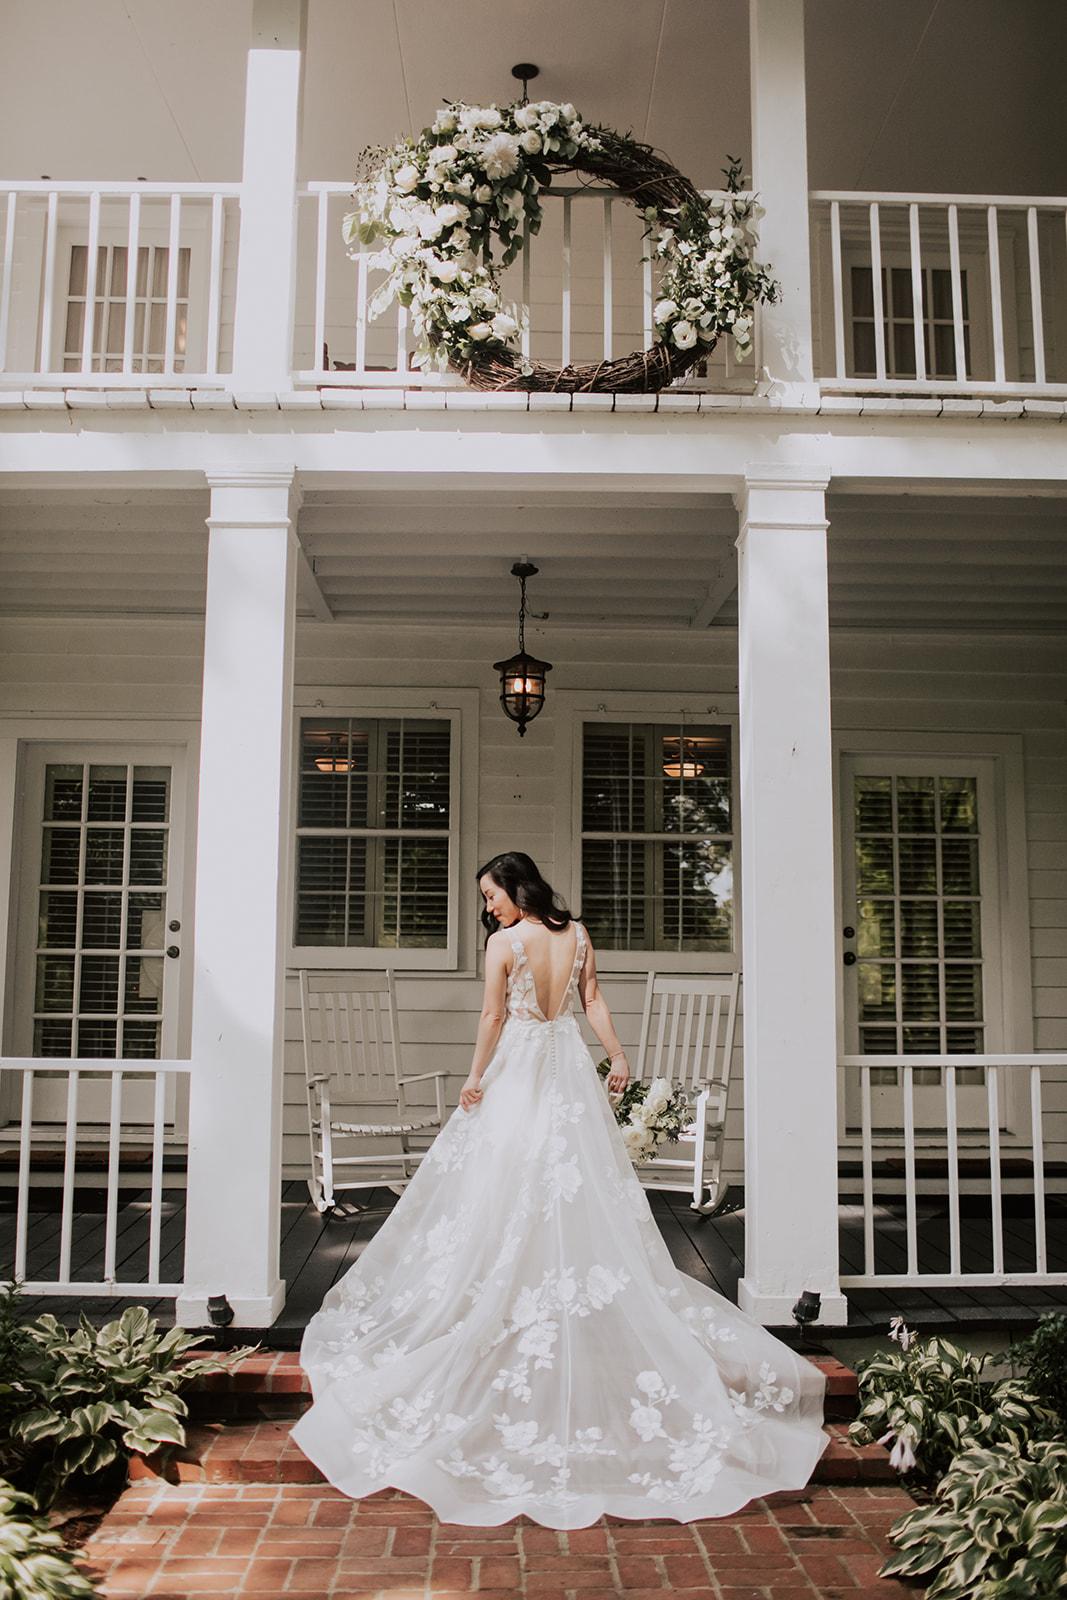 Wedding dress design: Summer Soiree at Cedarwood Weddings featured on Nashville Bride Guide